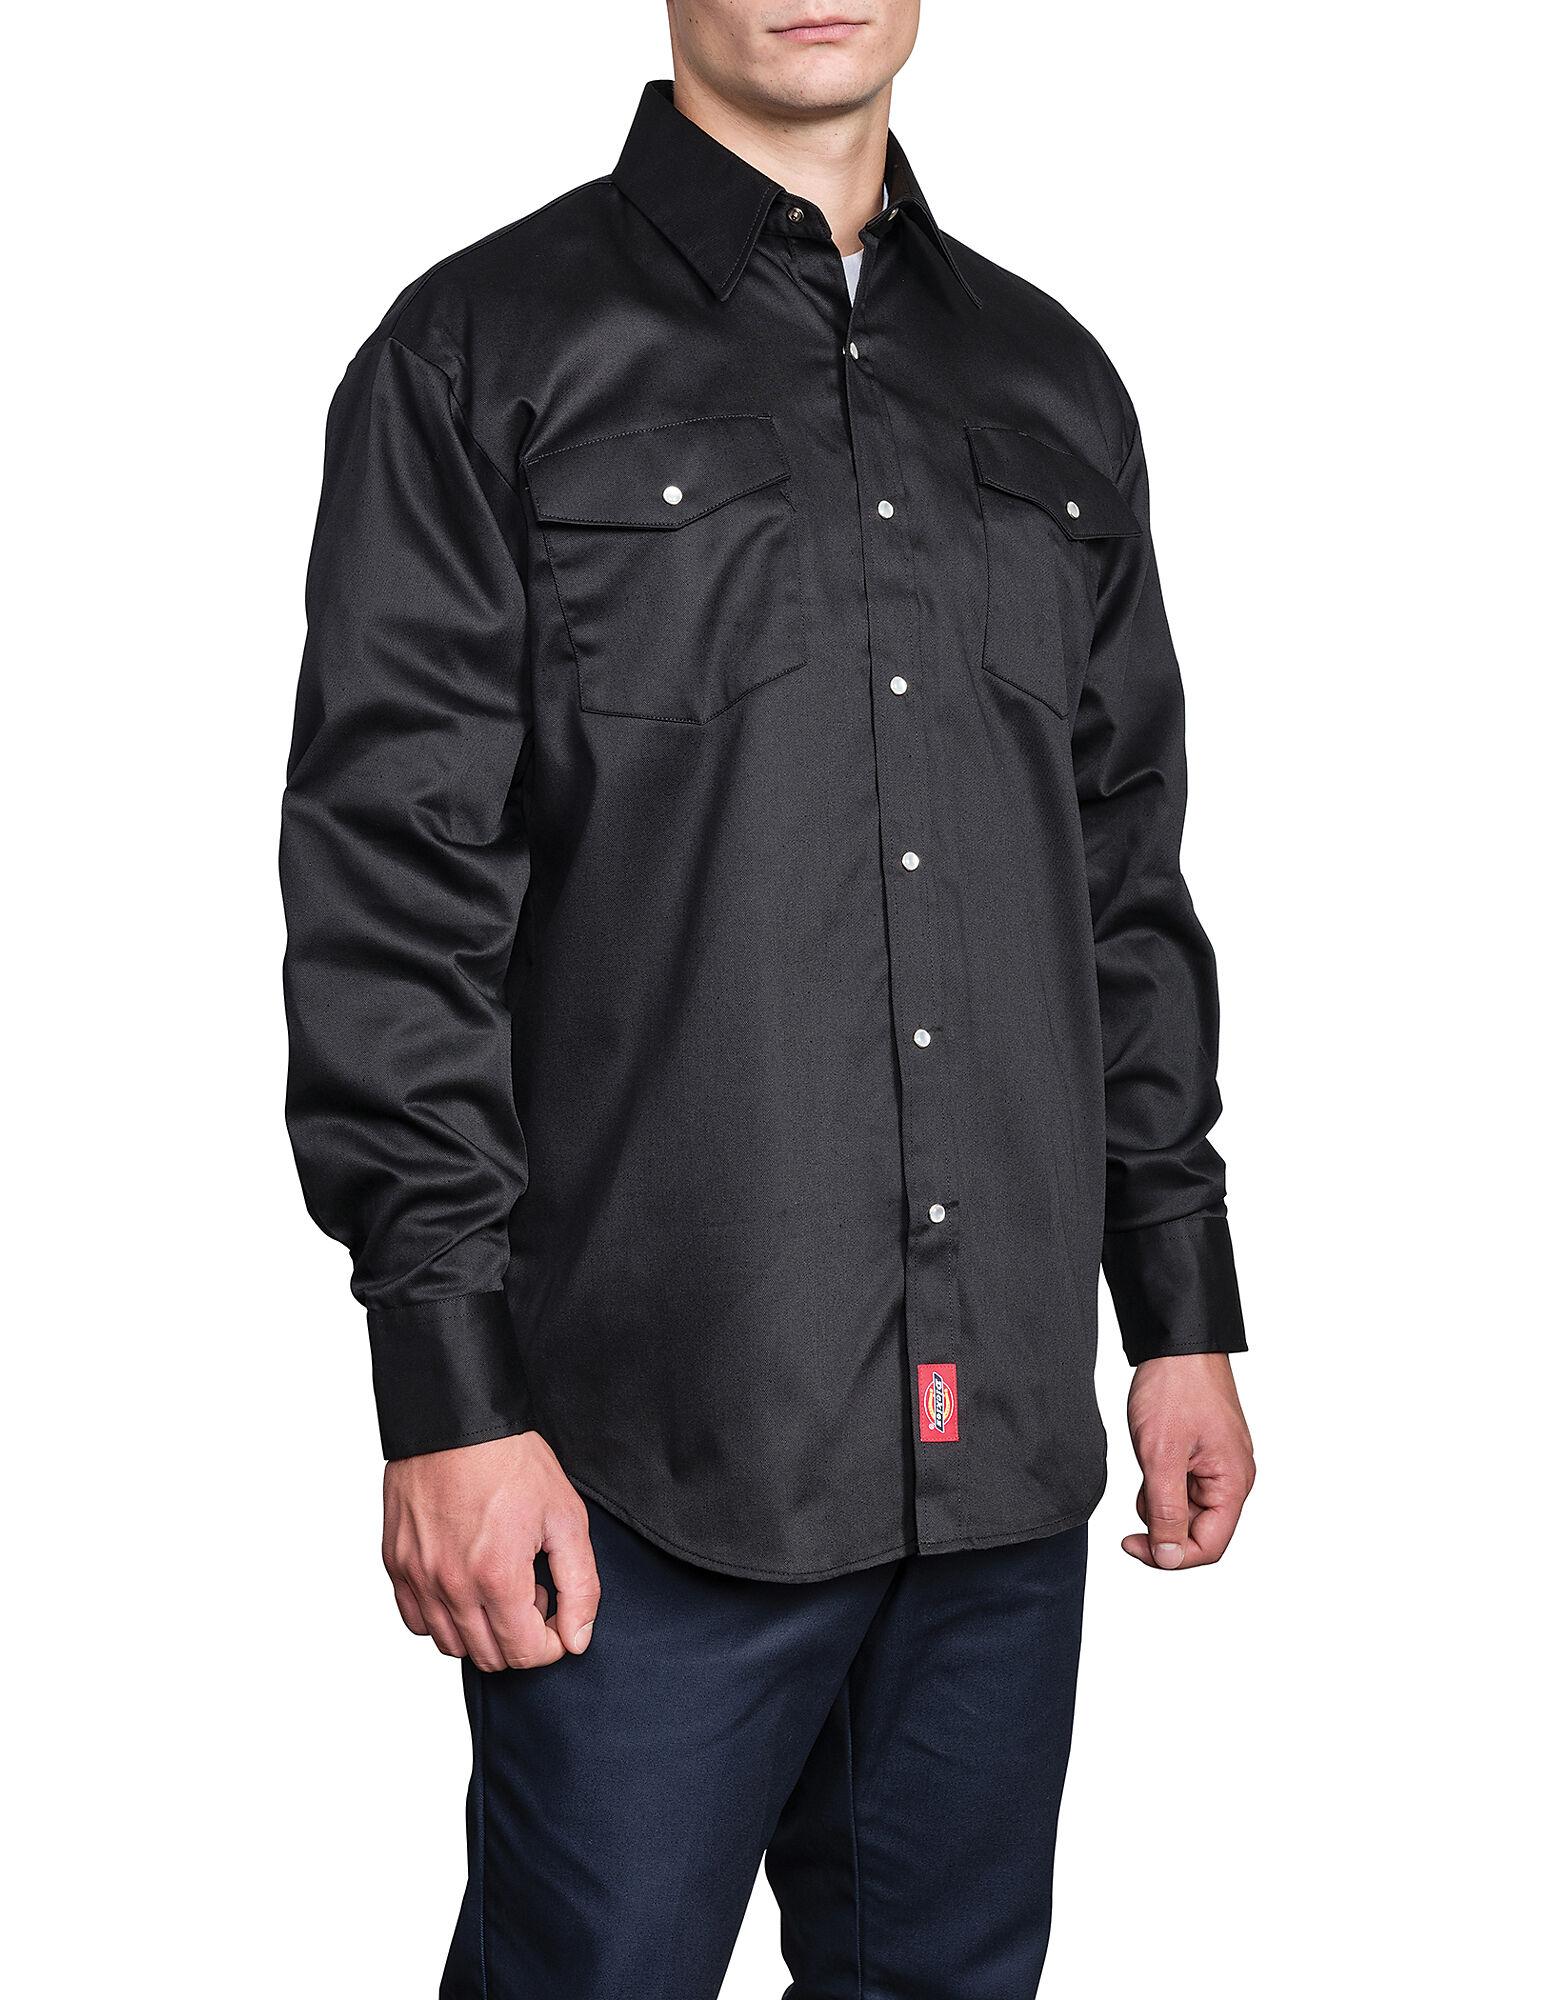 9b1731b5c3c7 Long Sleeve Snap Front Work Shirt - Black ...